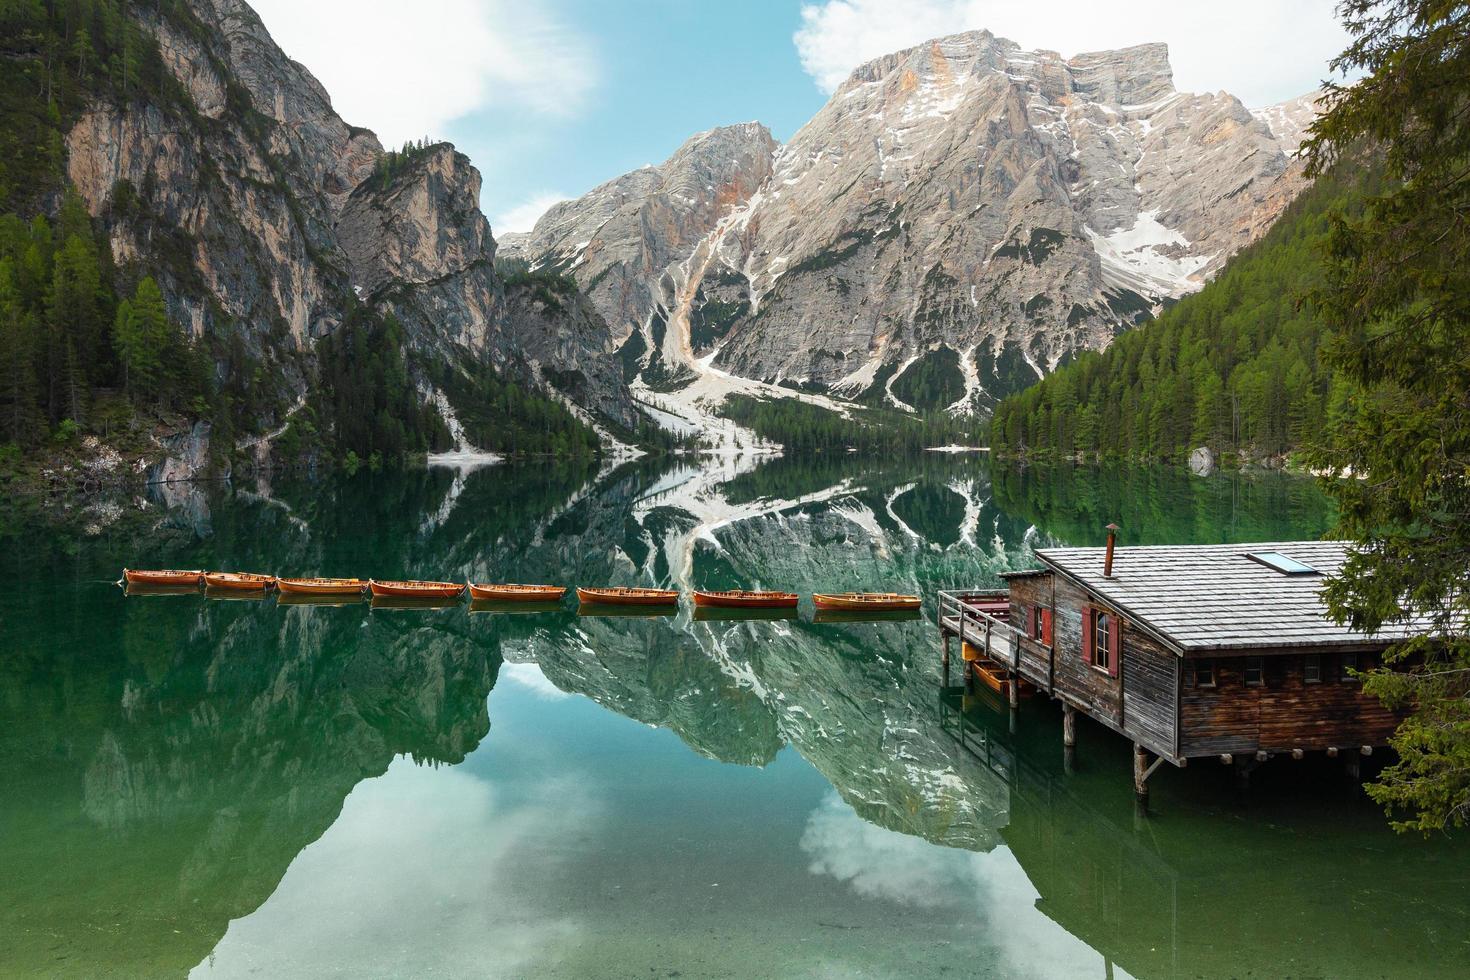 Lakehouse, dock en boten naast berg foto